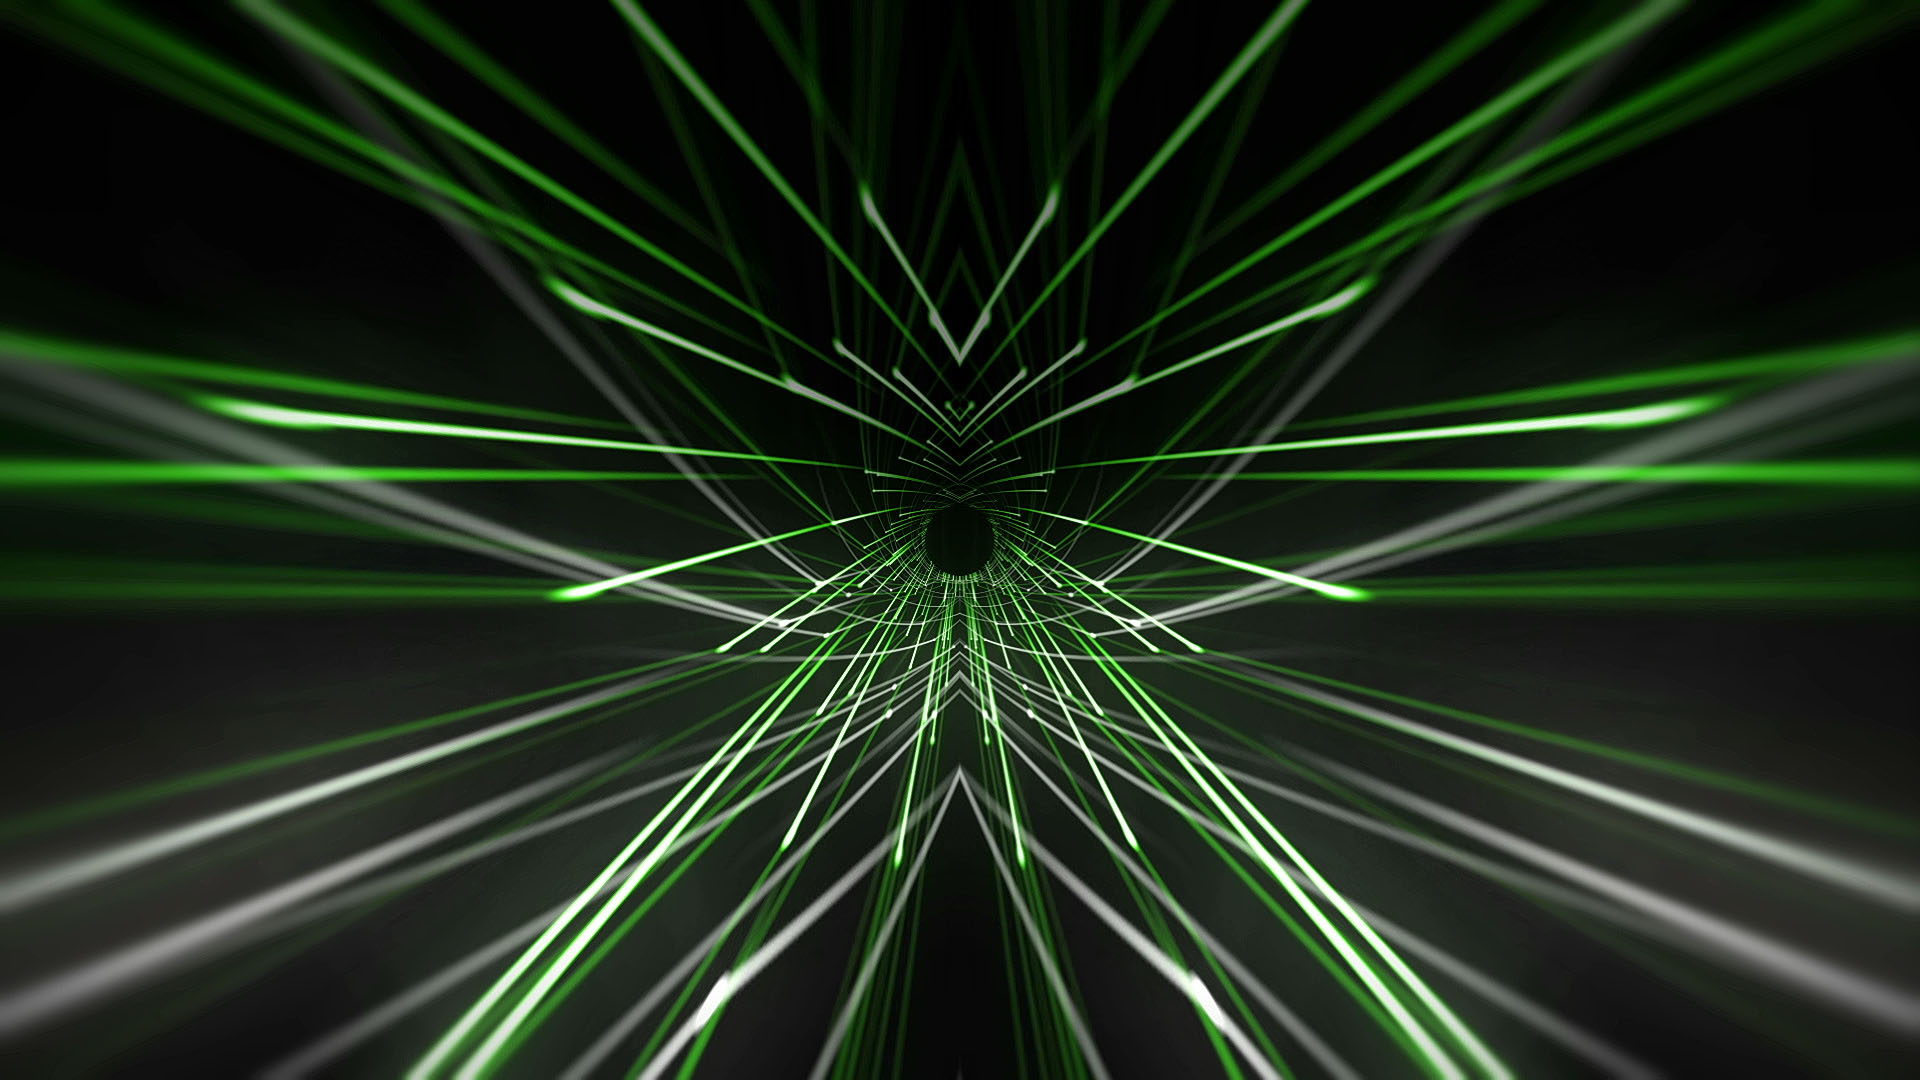 tunnel animation vj loops video